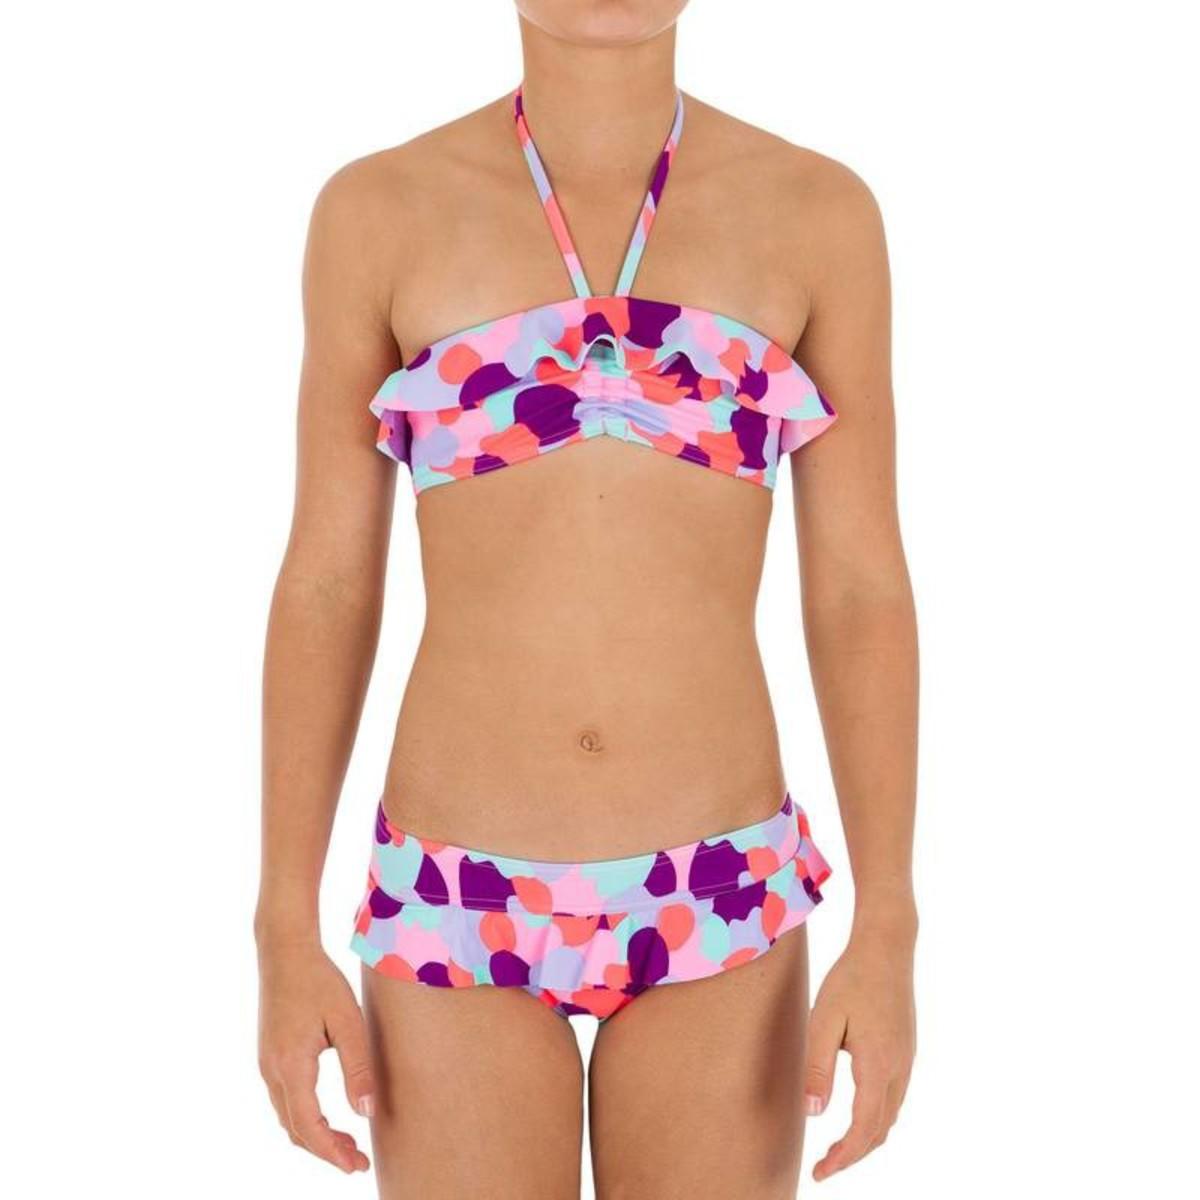 Bild 3 von Bikini-Set Bandeau Volant Camo Pink Mädchen TRIBORD